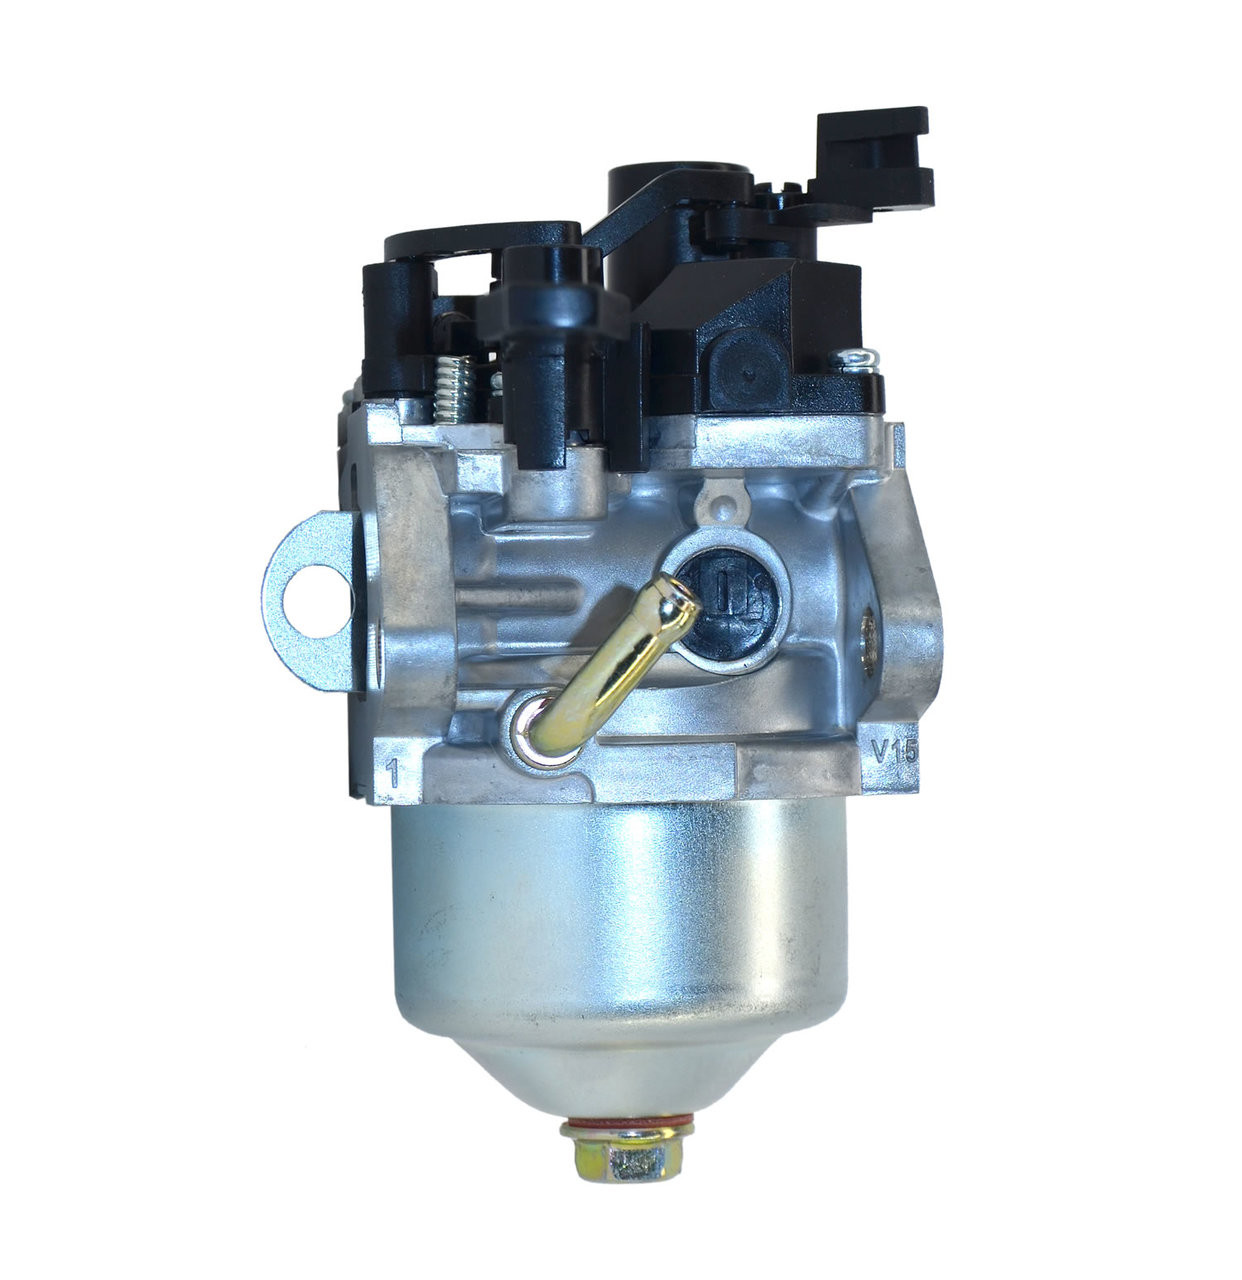 Tillotson TCT Mechanical Fuel Injection ( Carburetor Replacement)